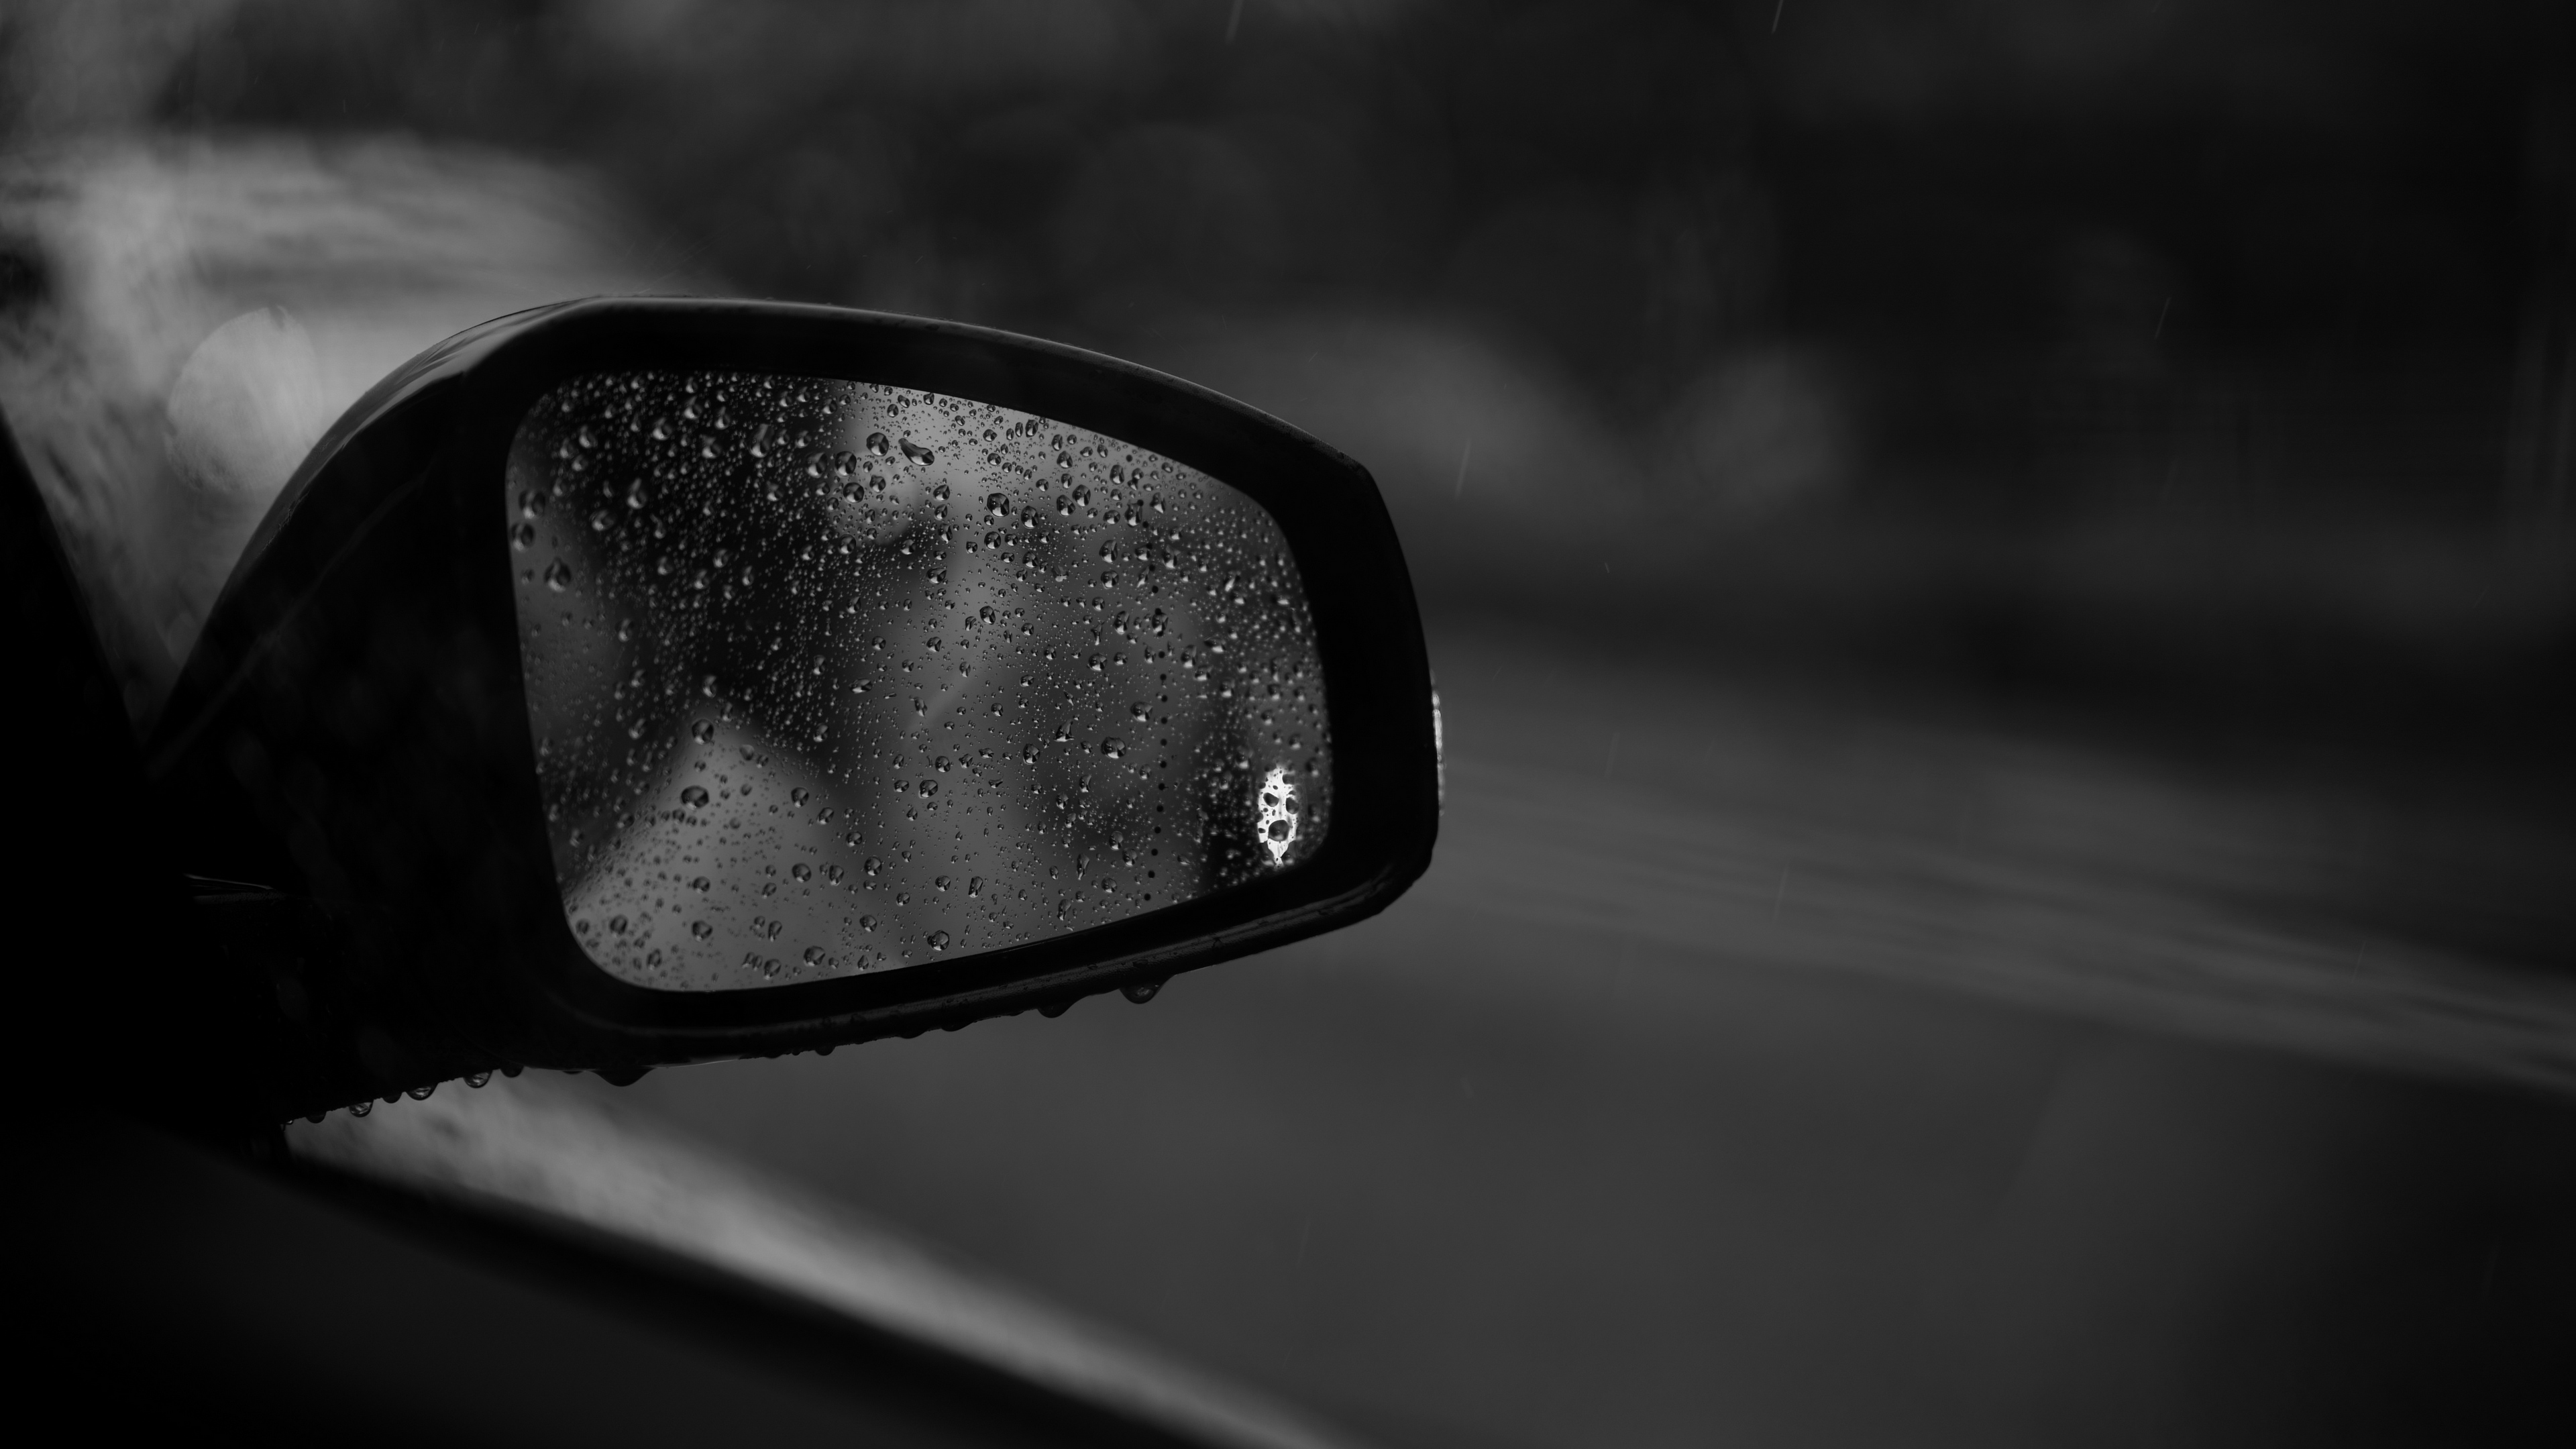 drops glass bw mirror car 4k 1540576007 - drops, glass, bw, mirror, car 4k - Glass, Drops, bw